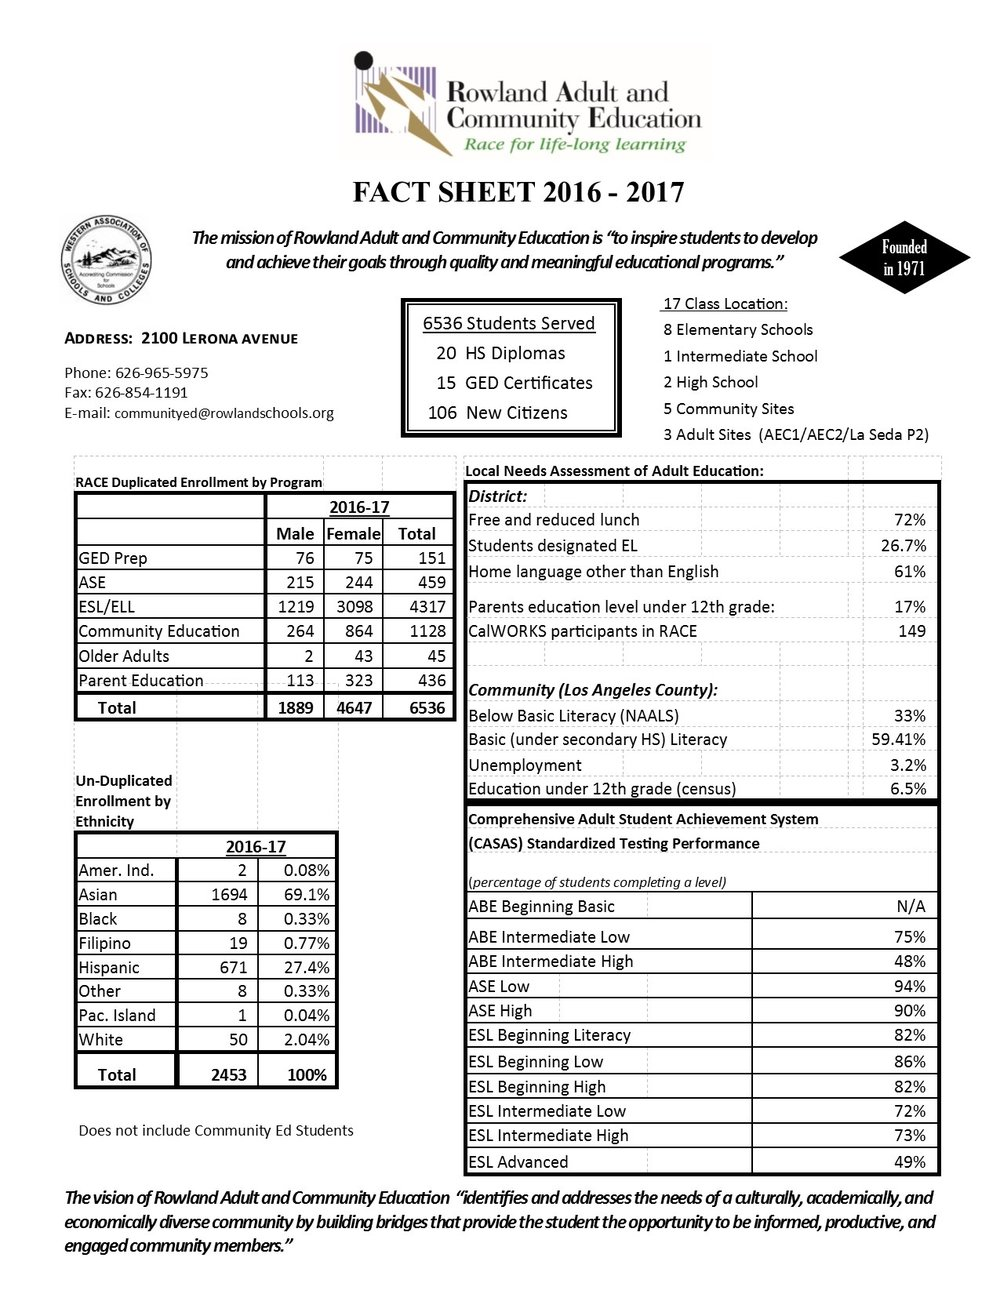 RACE Adult School Fact Sheet 2016-17.jpg